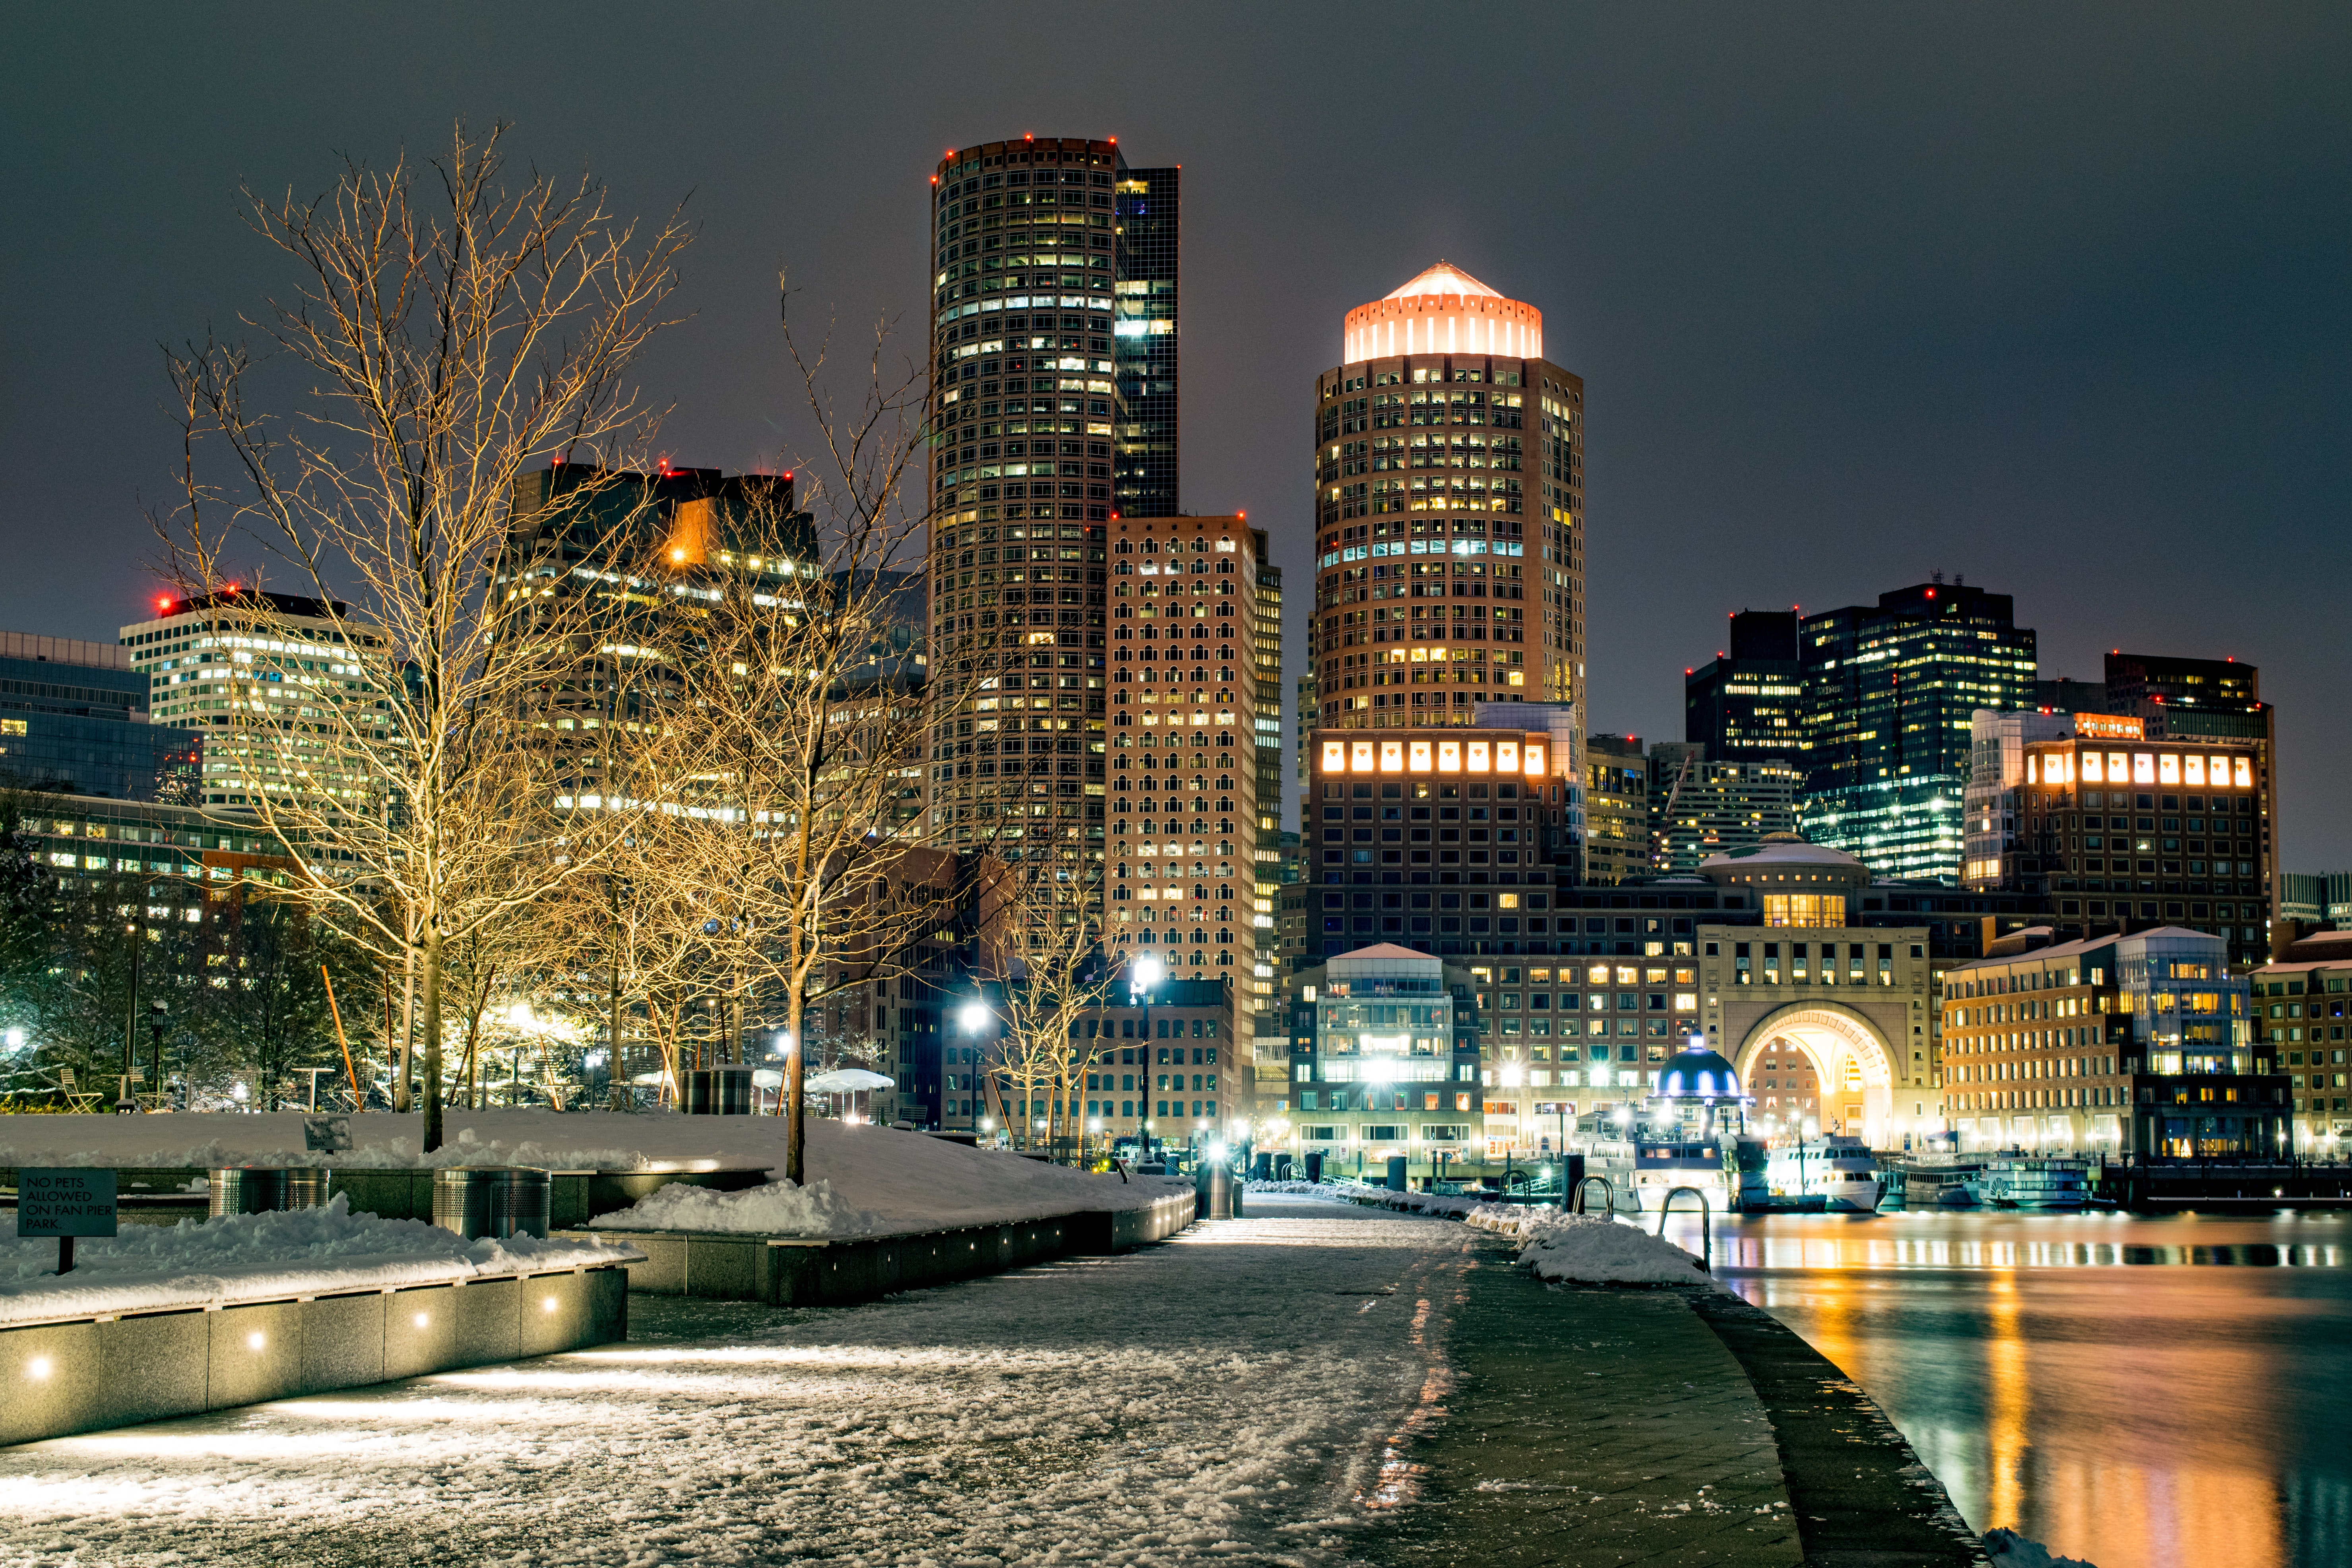 Boston Seaport at Night